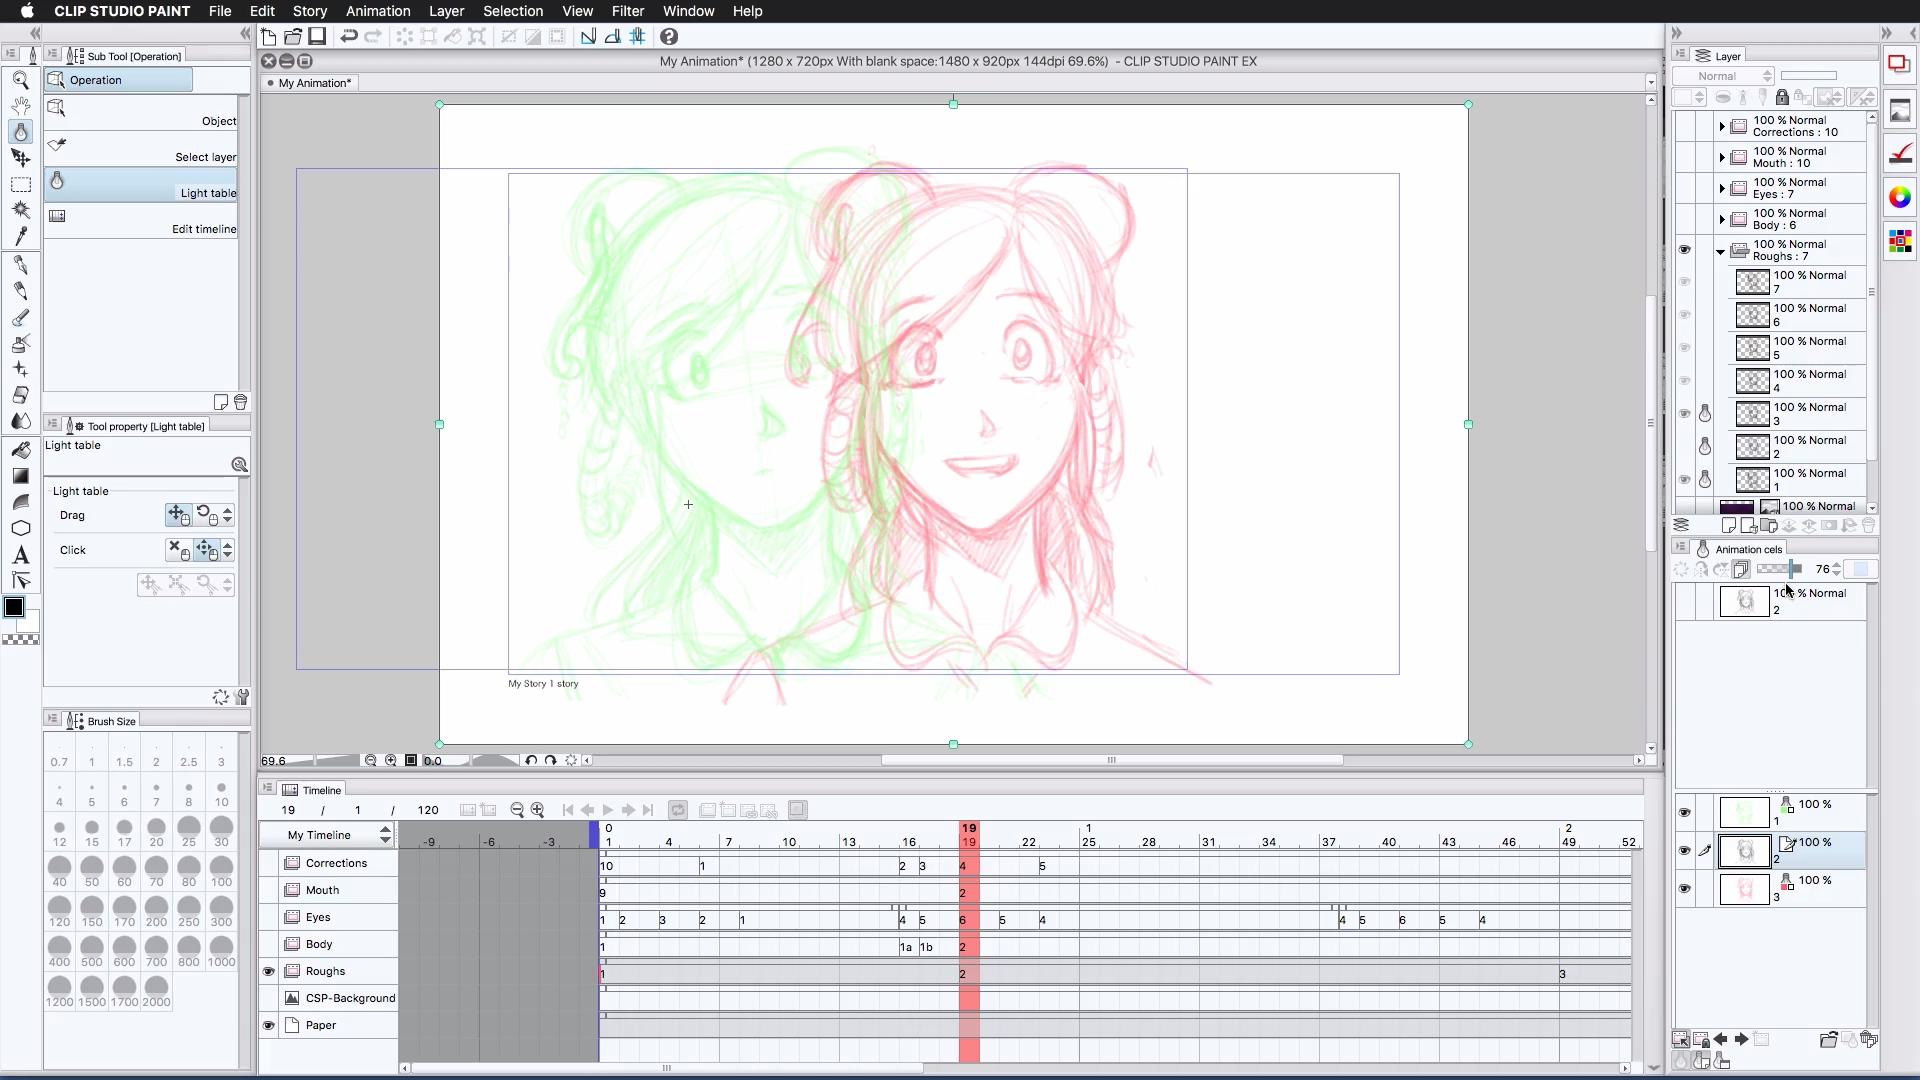 How to Animate in CLIP STUDIO PAINT® (Manga Studio) Video Tutorials.